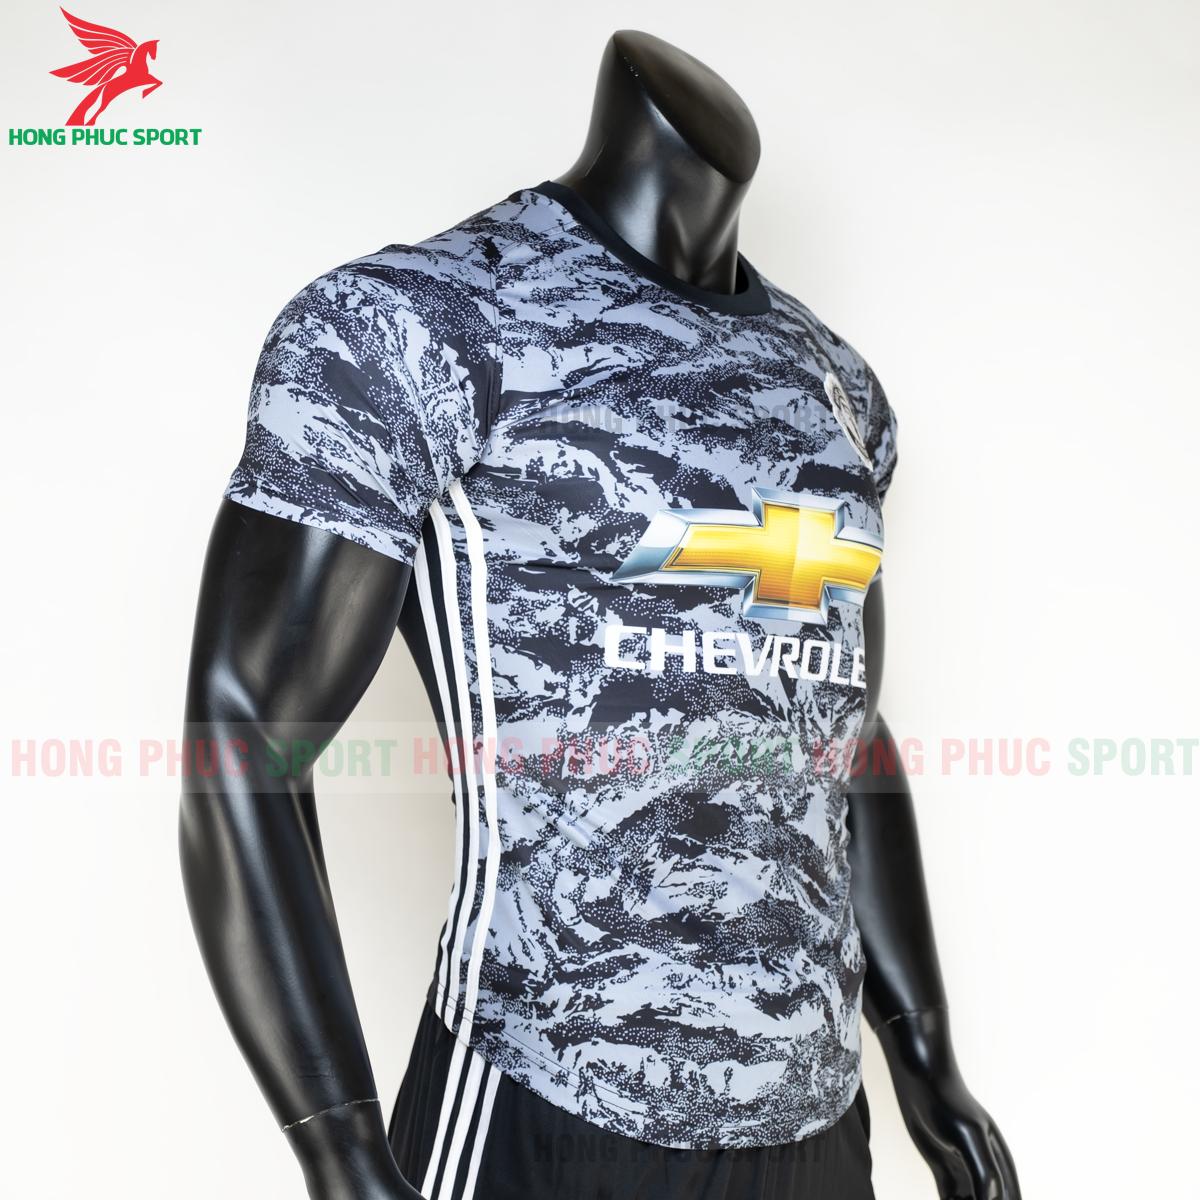 https://cdn.hongphucsport.com/unsafe/s4.shopbay.vn/files/285/ao-da-bong-manchester-united-2020-2021-phien-ban-fan-5-5fe1b75e9b274.png